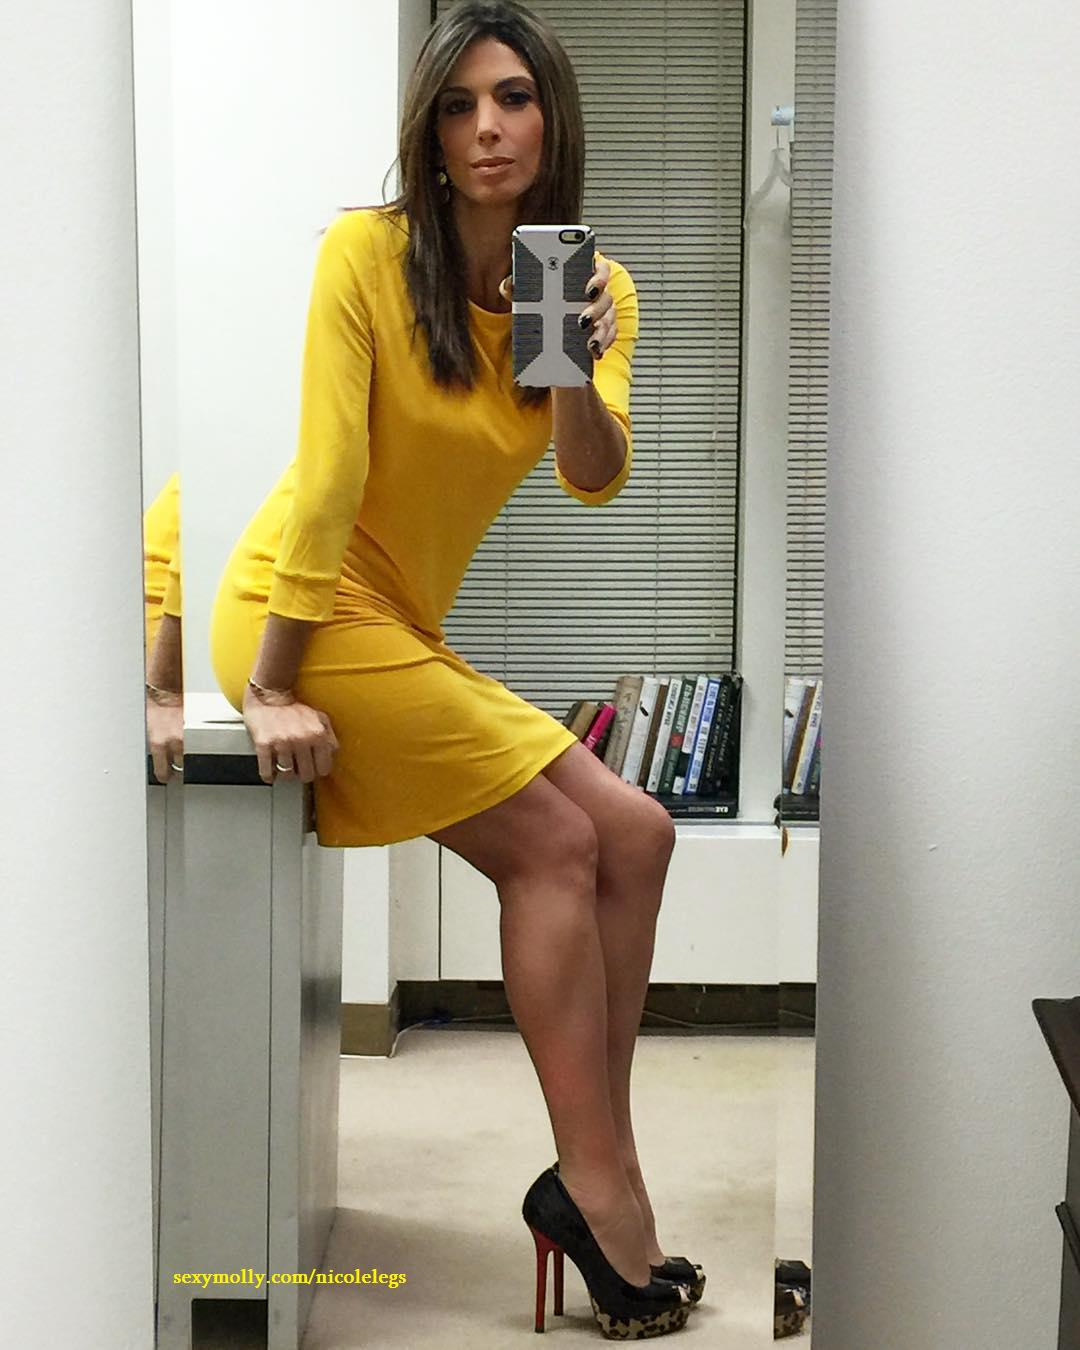 Nicole petallides upskirt